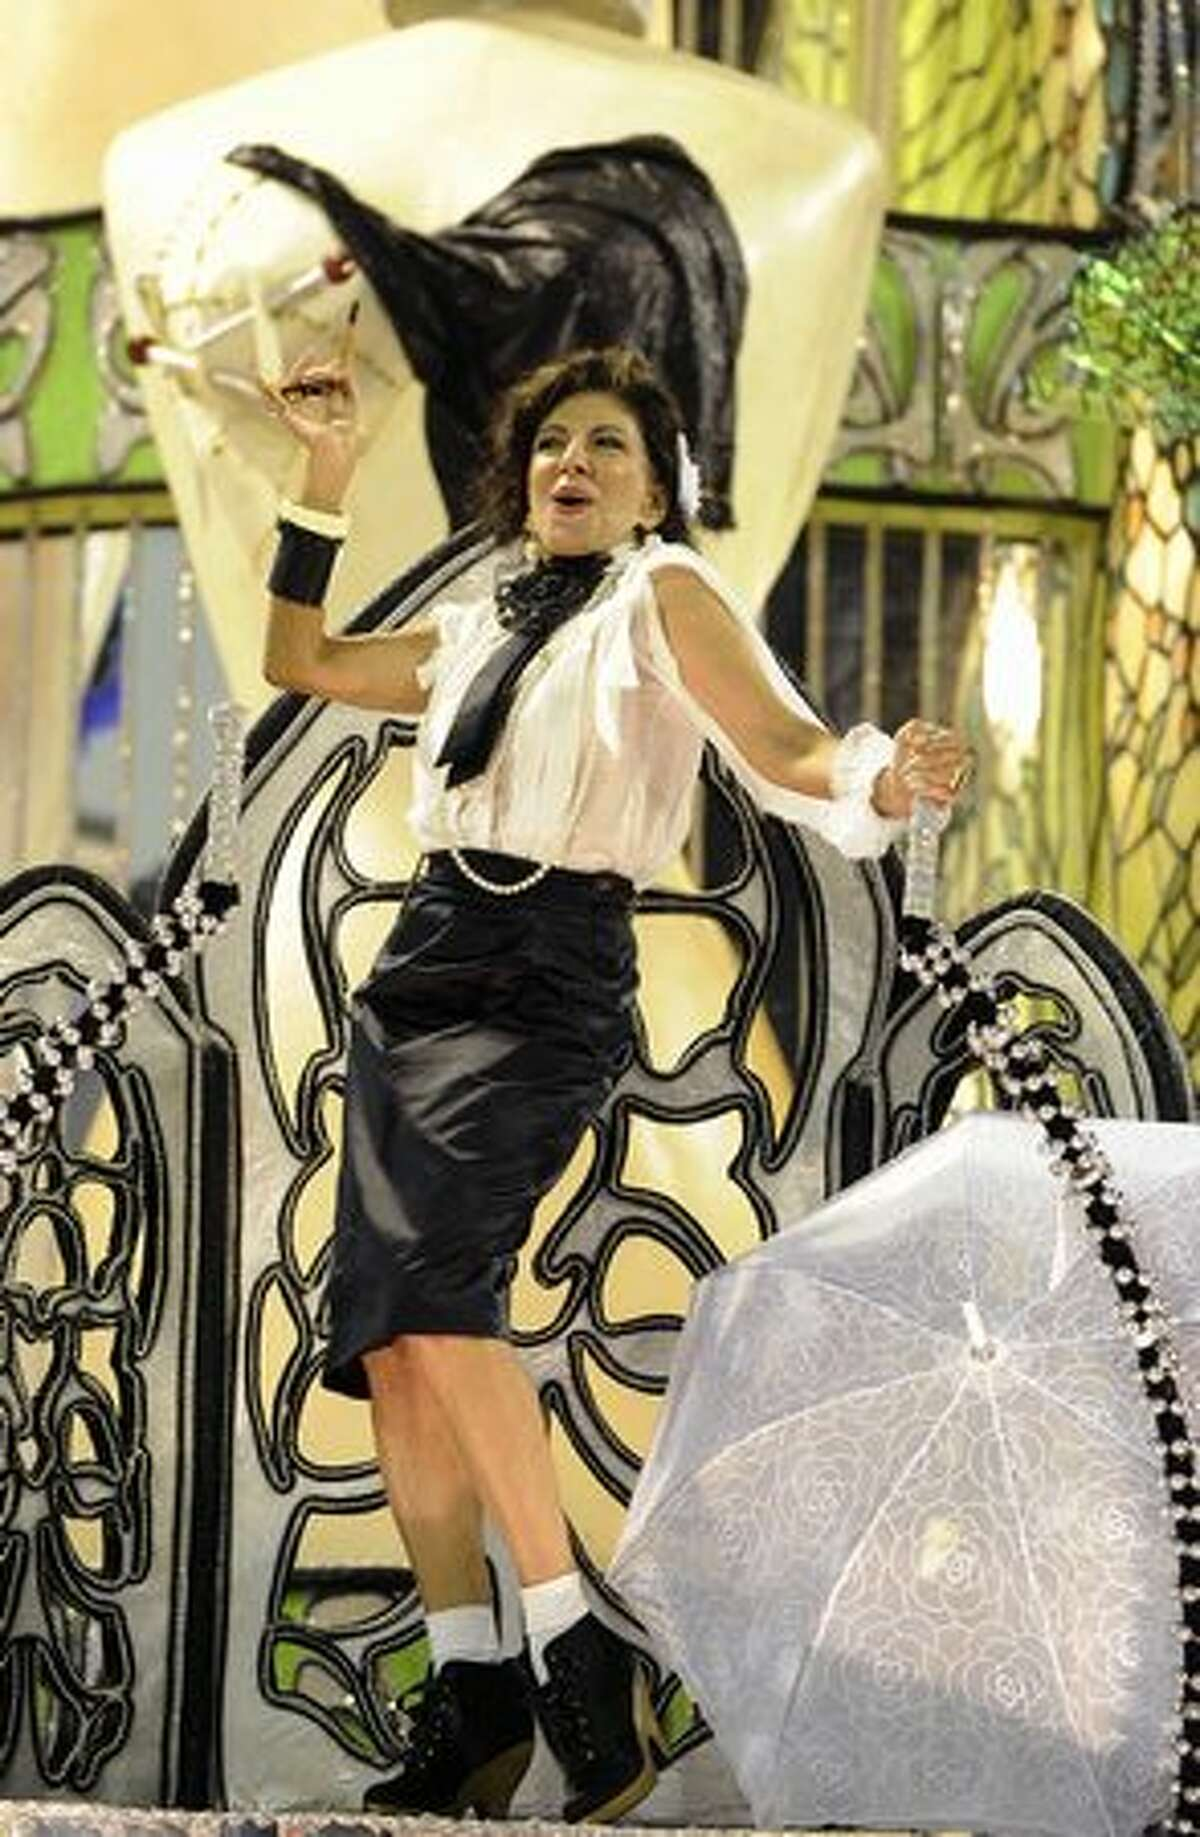 "Brazilian actress Marilia Pera represents French stylist Coco Chanel over a float of the samba school Porto da Pedra as part of their theme ""Fashion"", during the second night of Rio's famed Carnival, at the Sambodrome in Rio de Janeiro, Brazil."